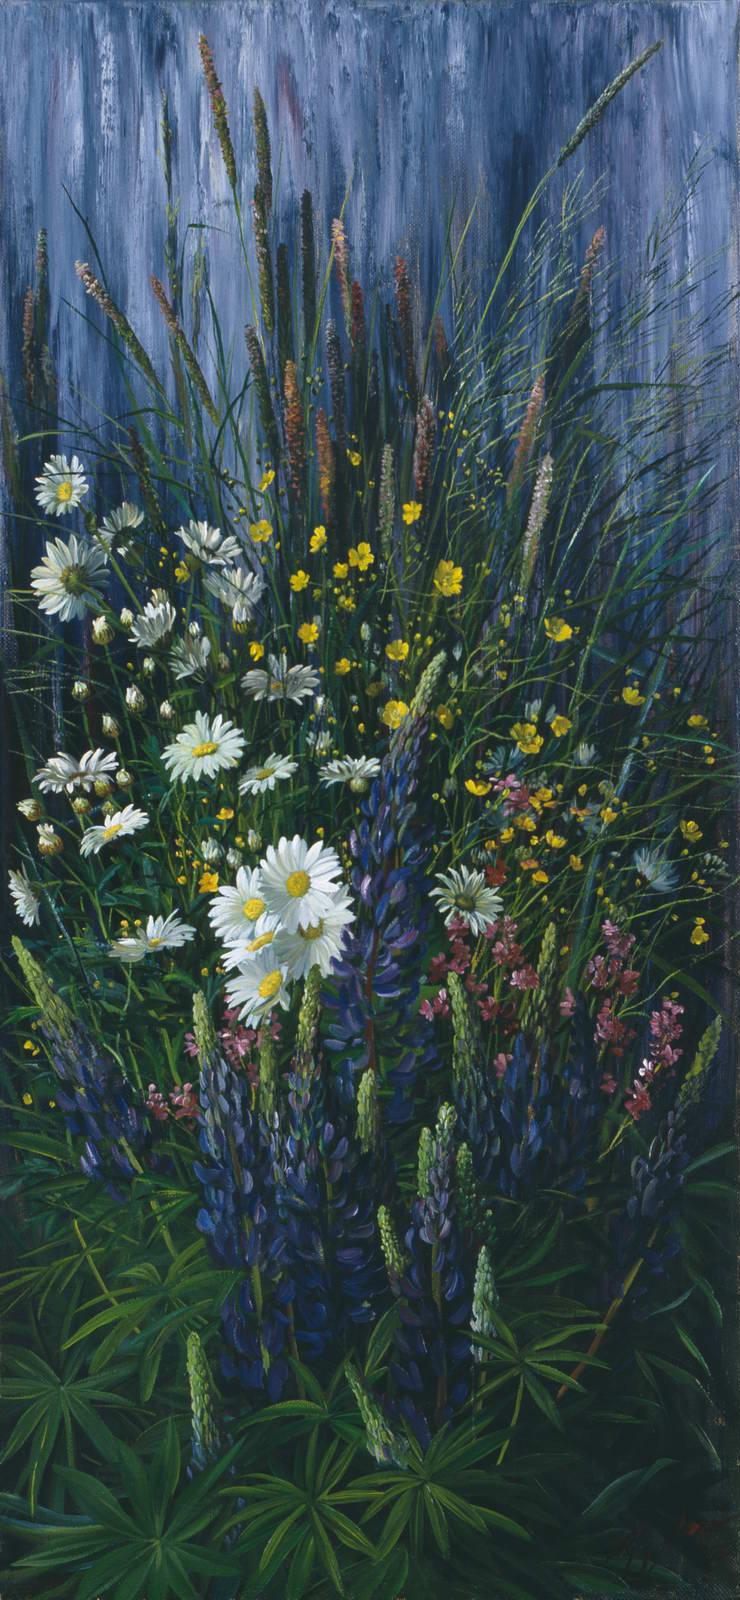 """Полевые цветы"" - х.м. (100х46) - 2003 г"